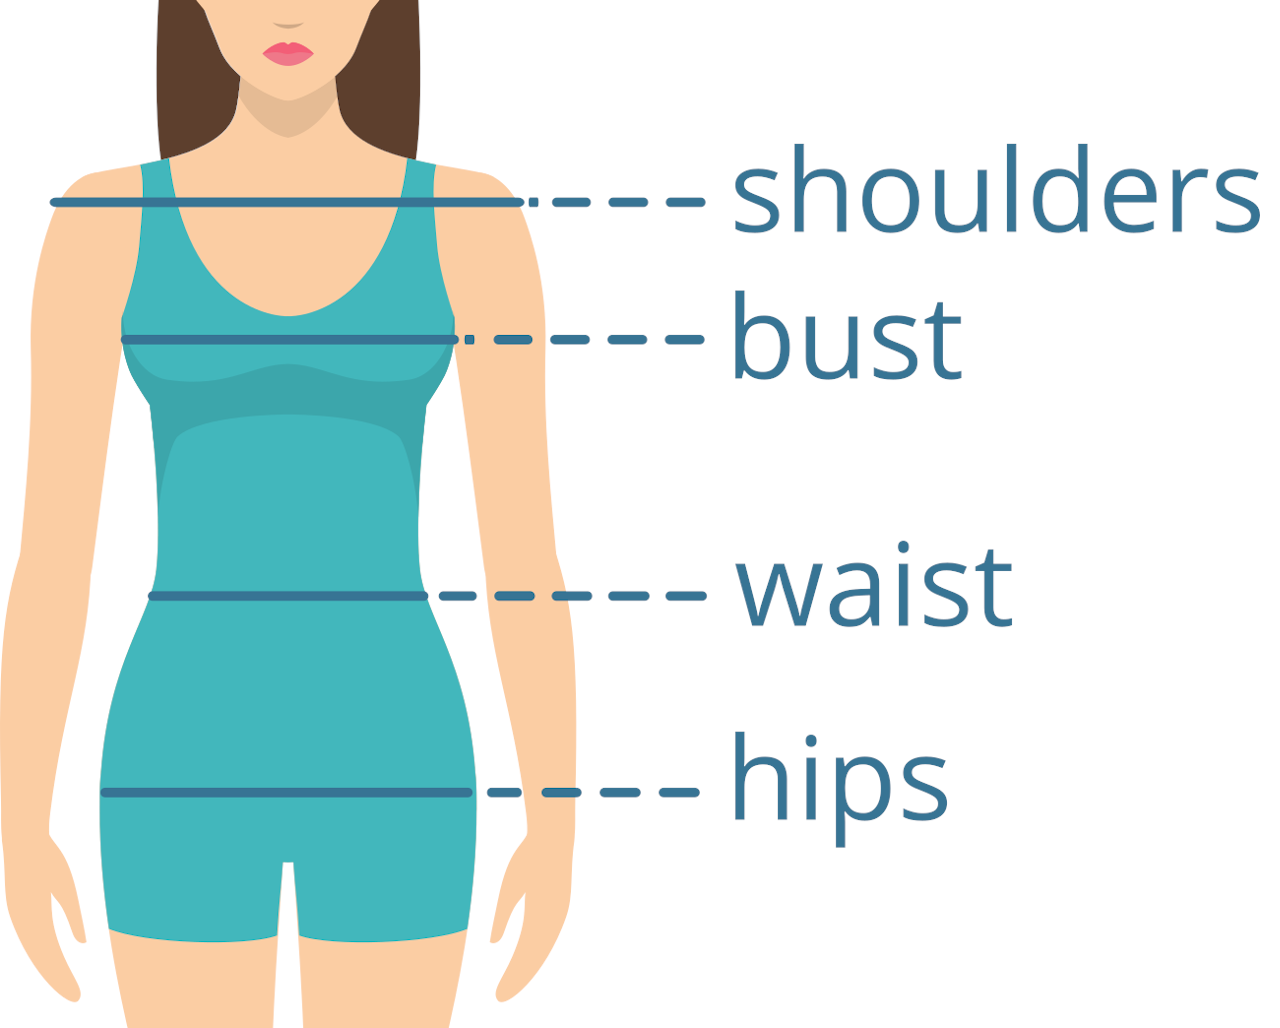 illustration showing body shape measurement locations